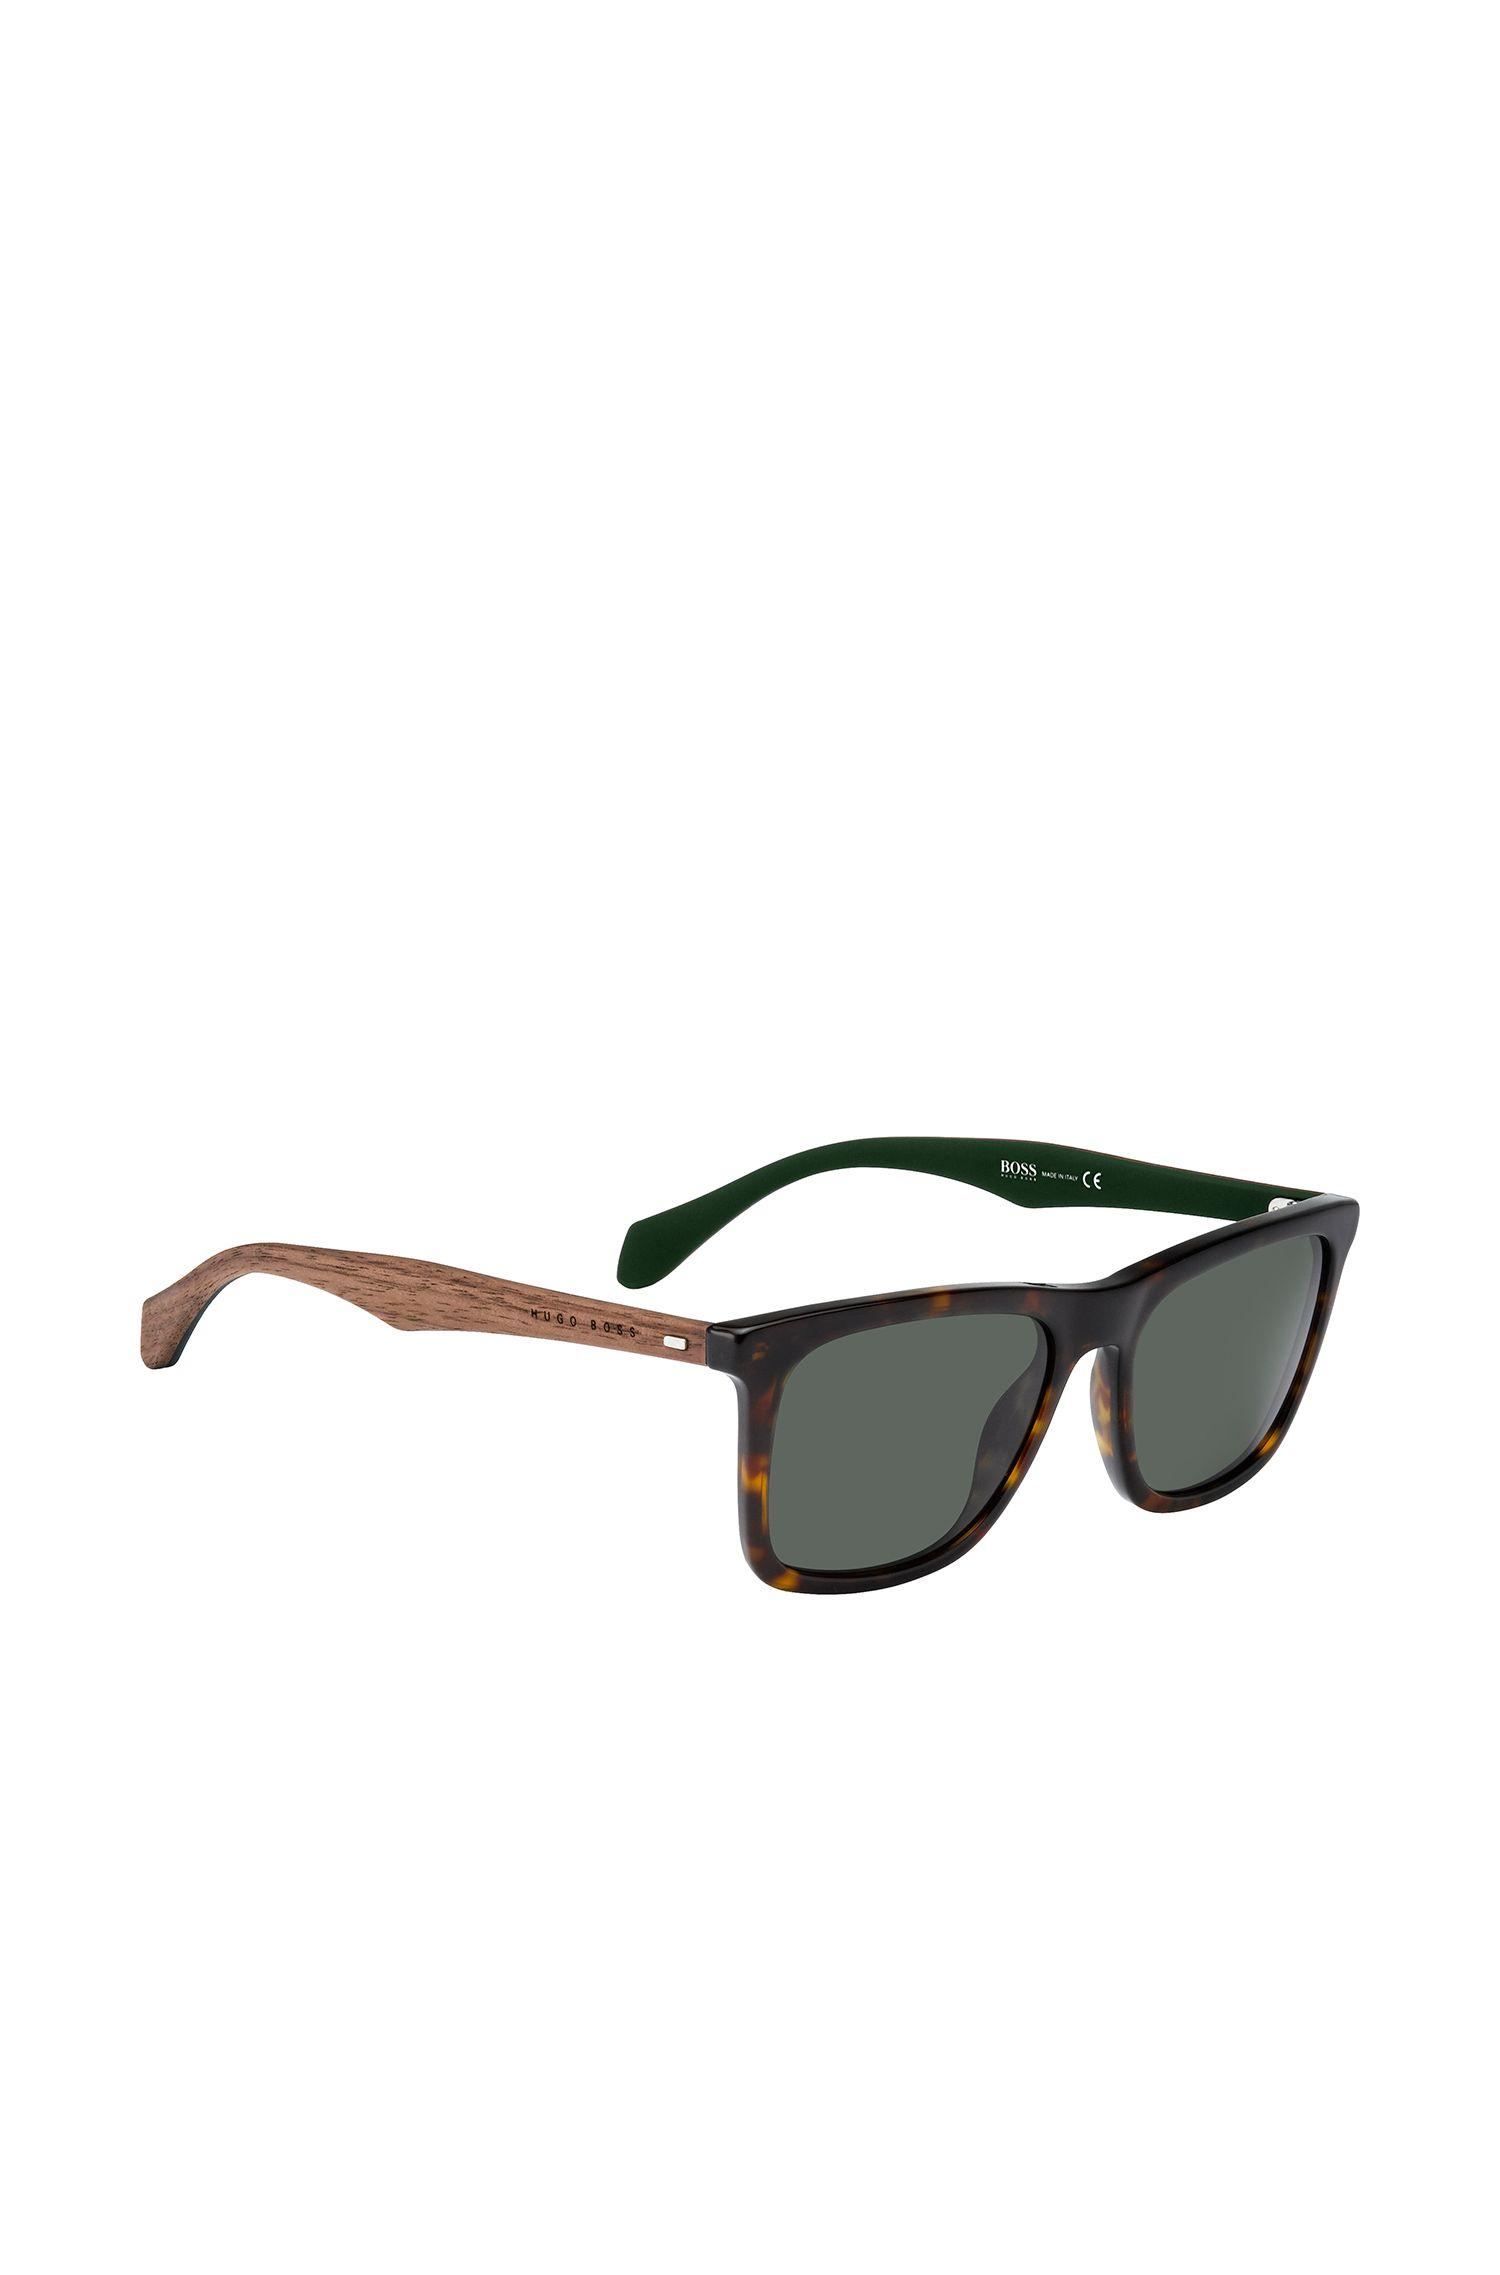 'BOSS 0776S' | Gray Green Lens Walnut Sunglasses